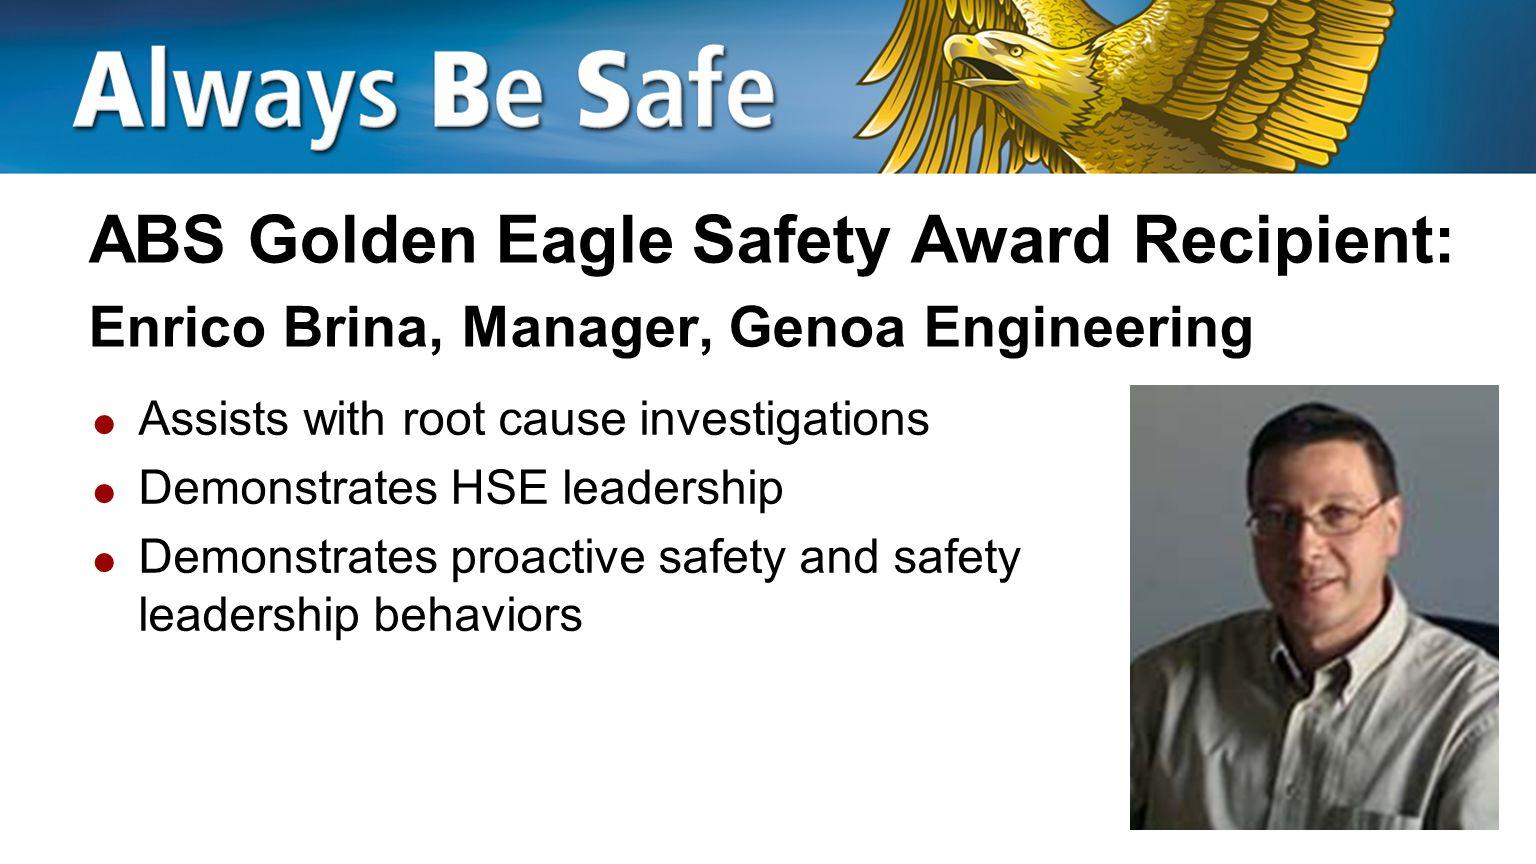 ABS Golden Eagle Safety Award Recipient: Enrico Brina, Manager, Genoa Engineering